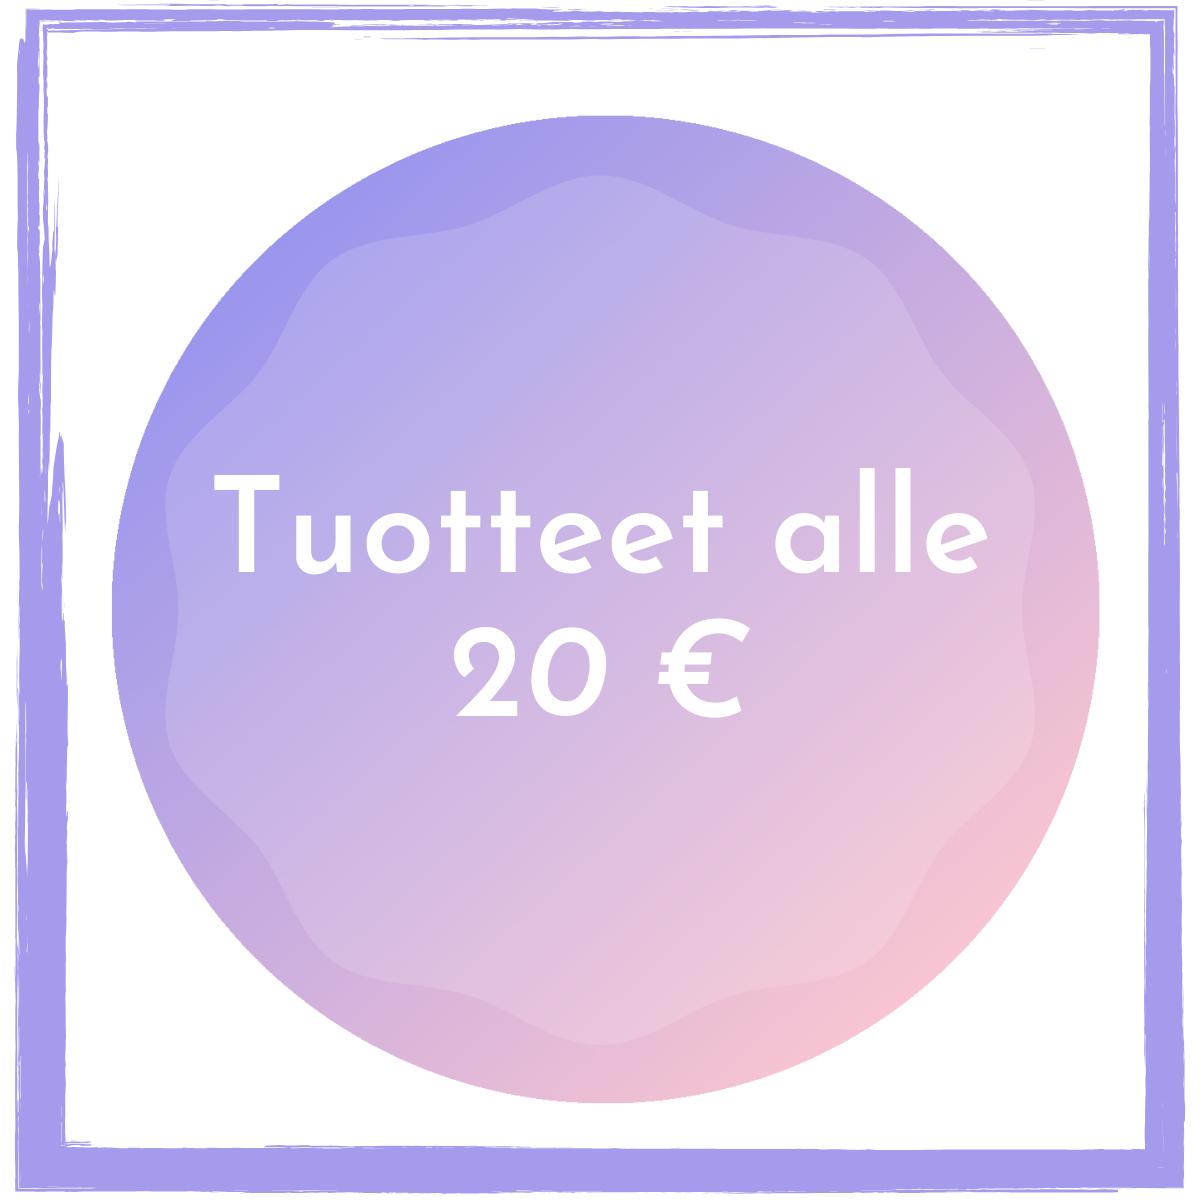 Alle 20 euroa